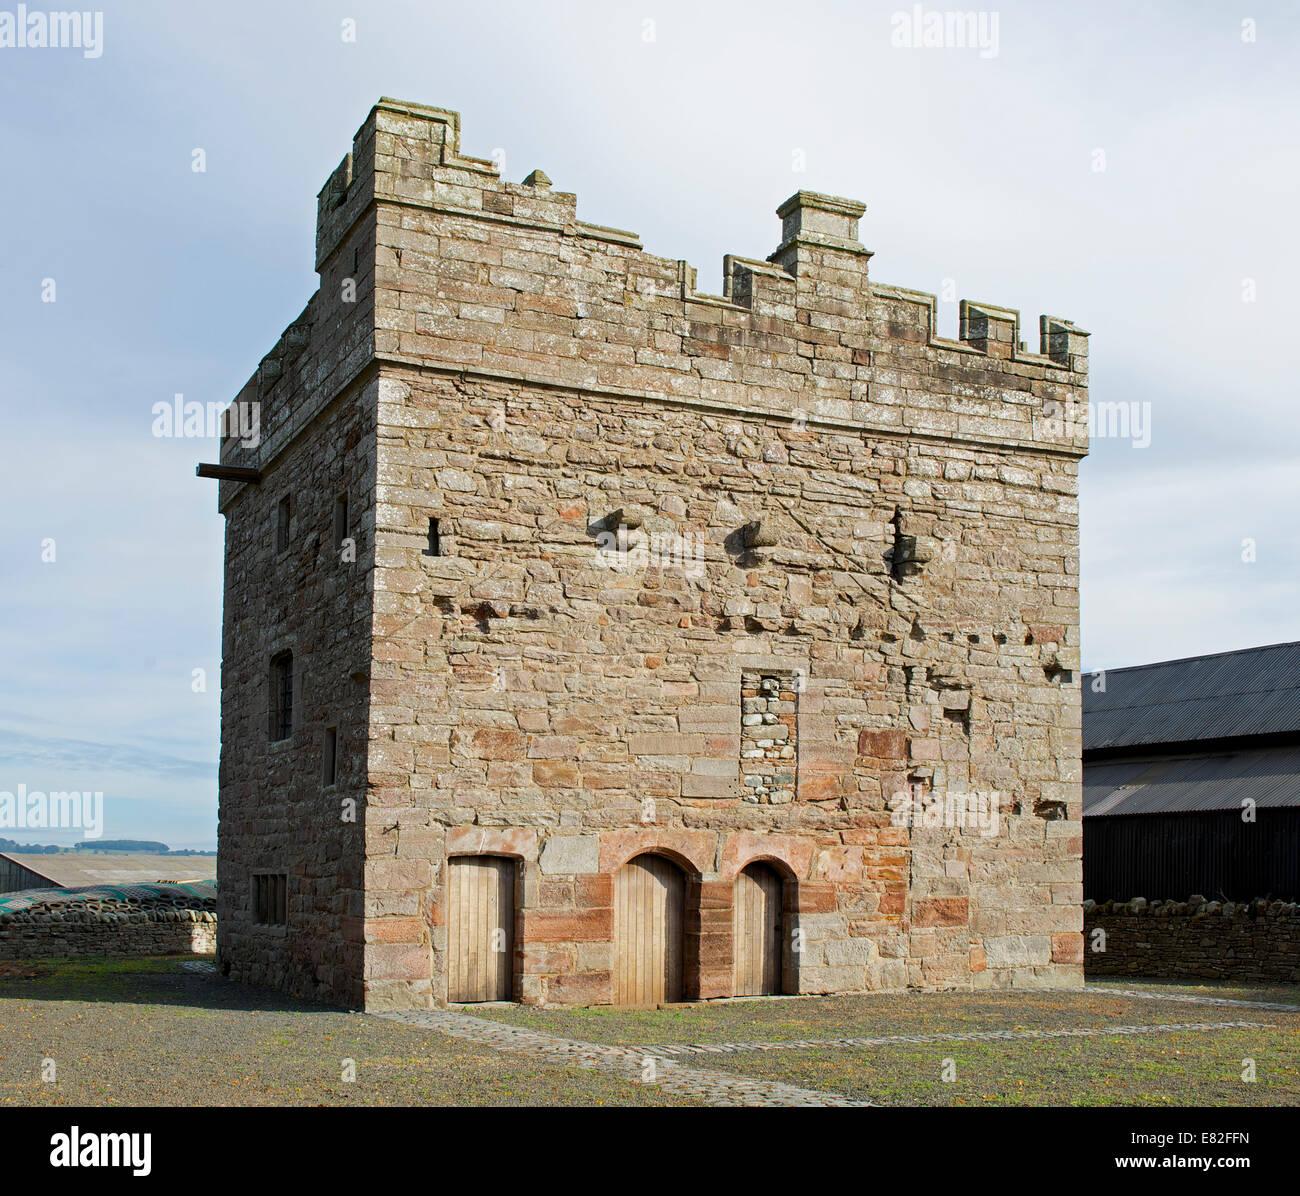 The pele tower of Clifton Hall, Cumbria, England UK - Stock Image